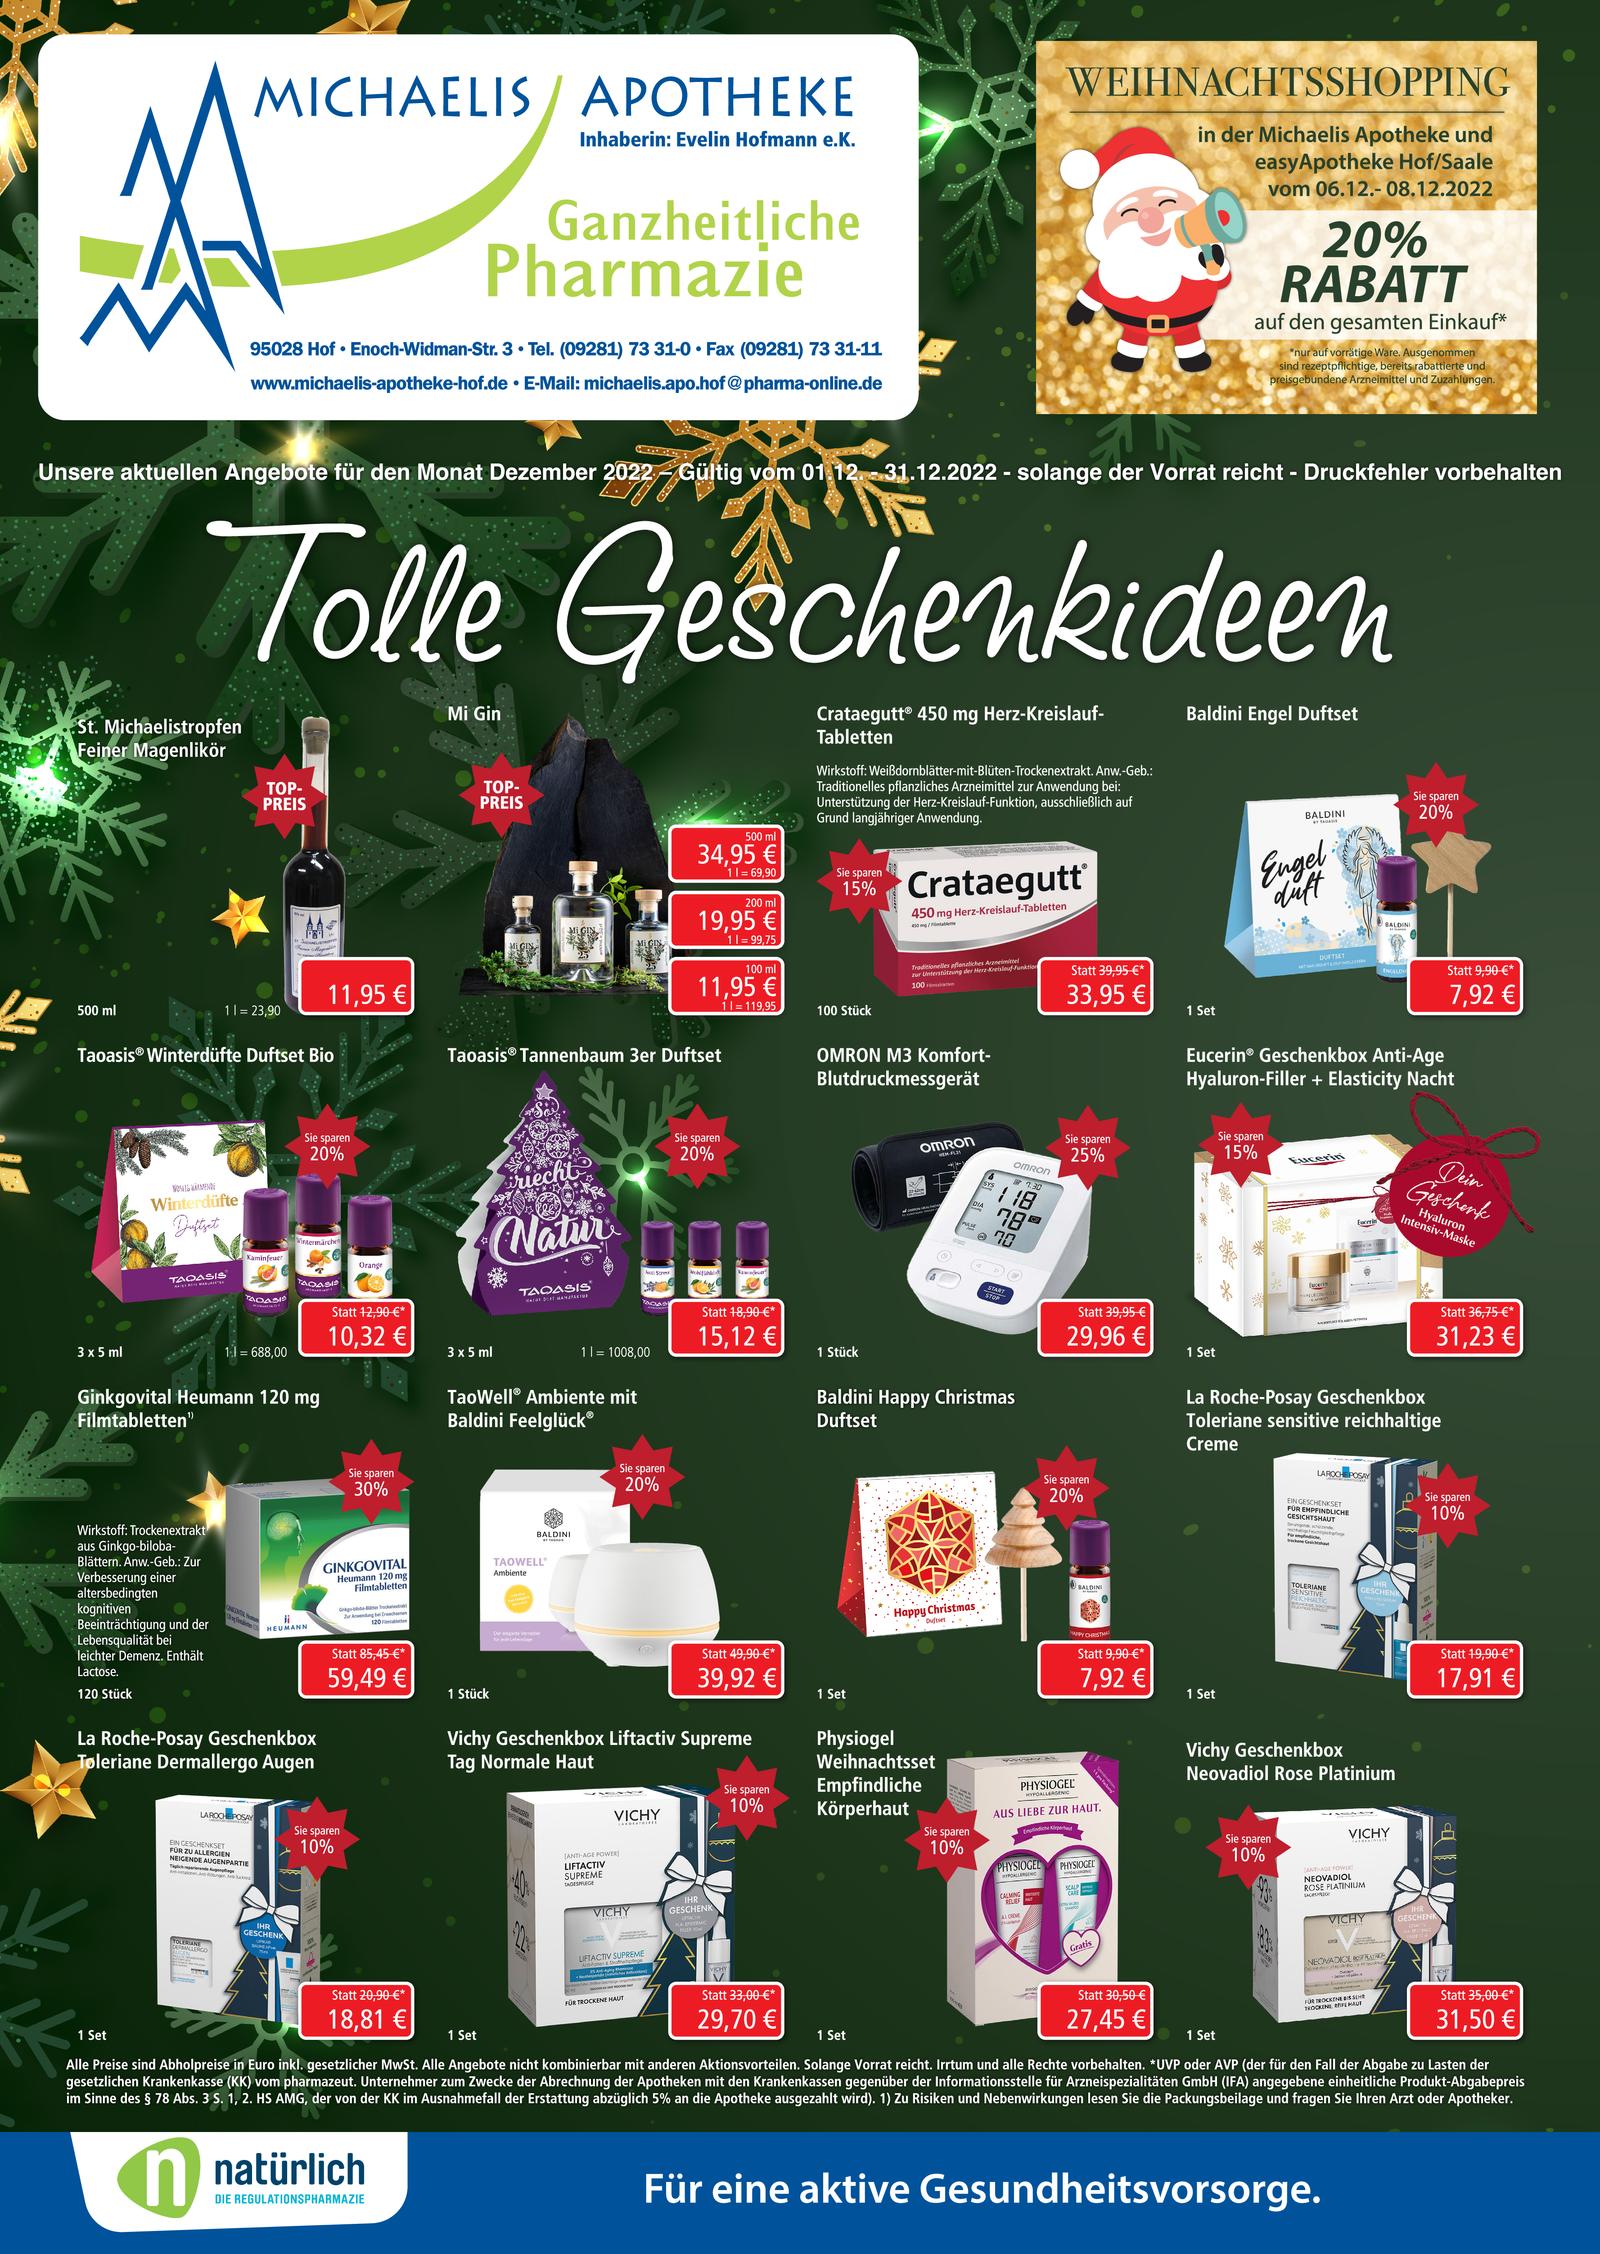 https://mein-uploads.apocdn.net/8309/leaflets/8309_flyer-Seite1.png